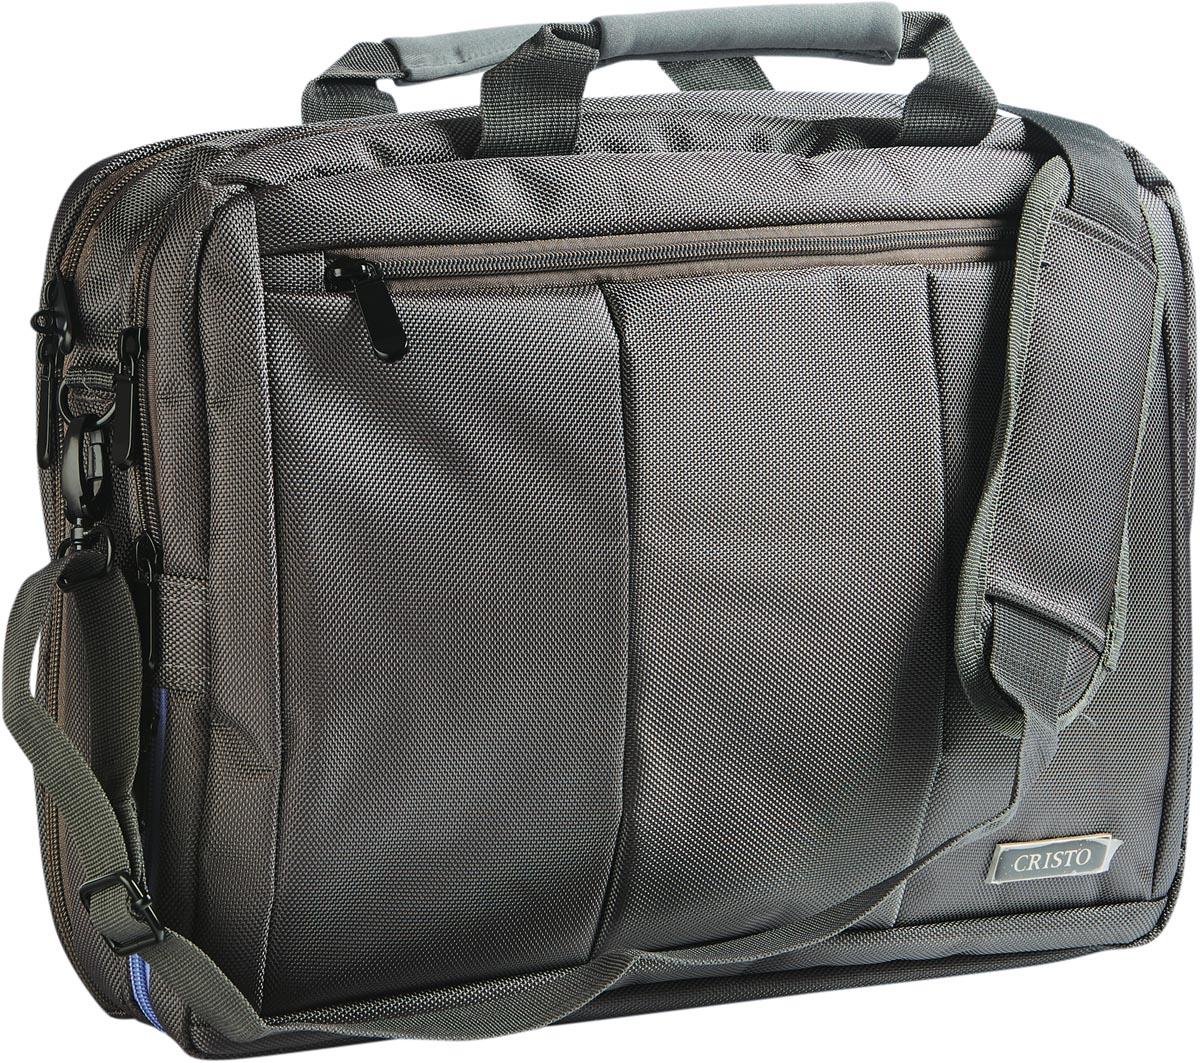 Cristo Portable laptoptas voor 15 inch laptops, 2-in-1, antraciet